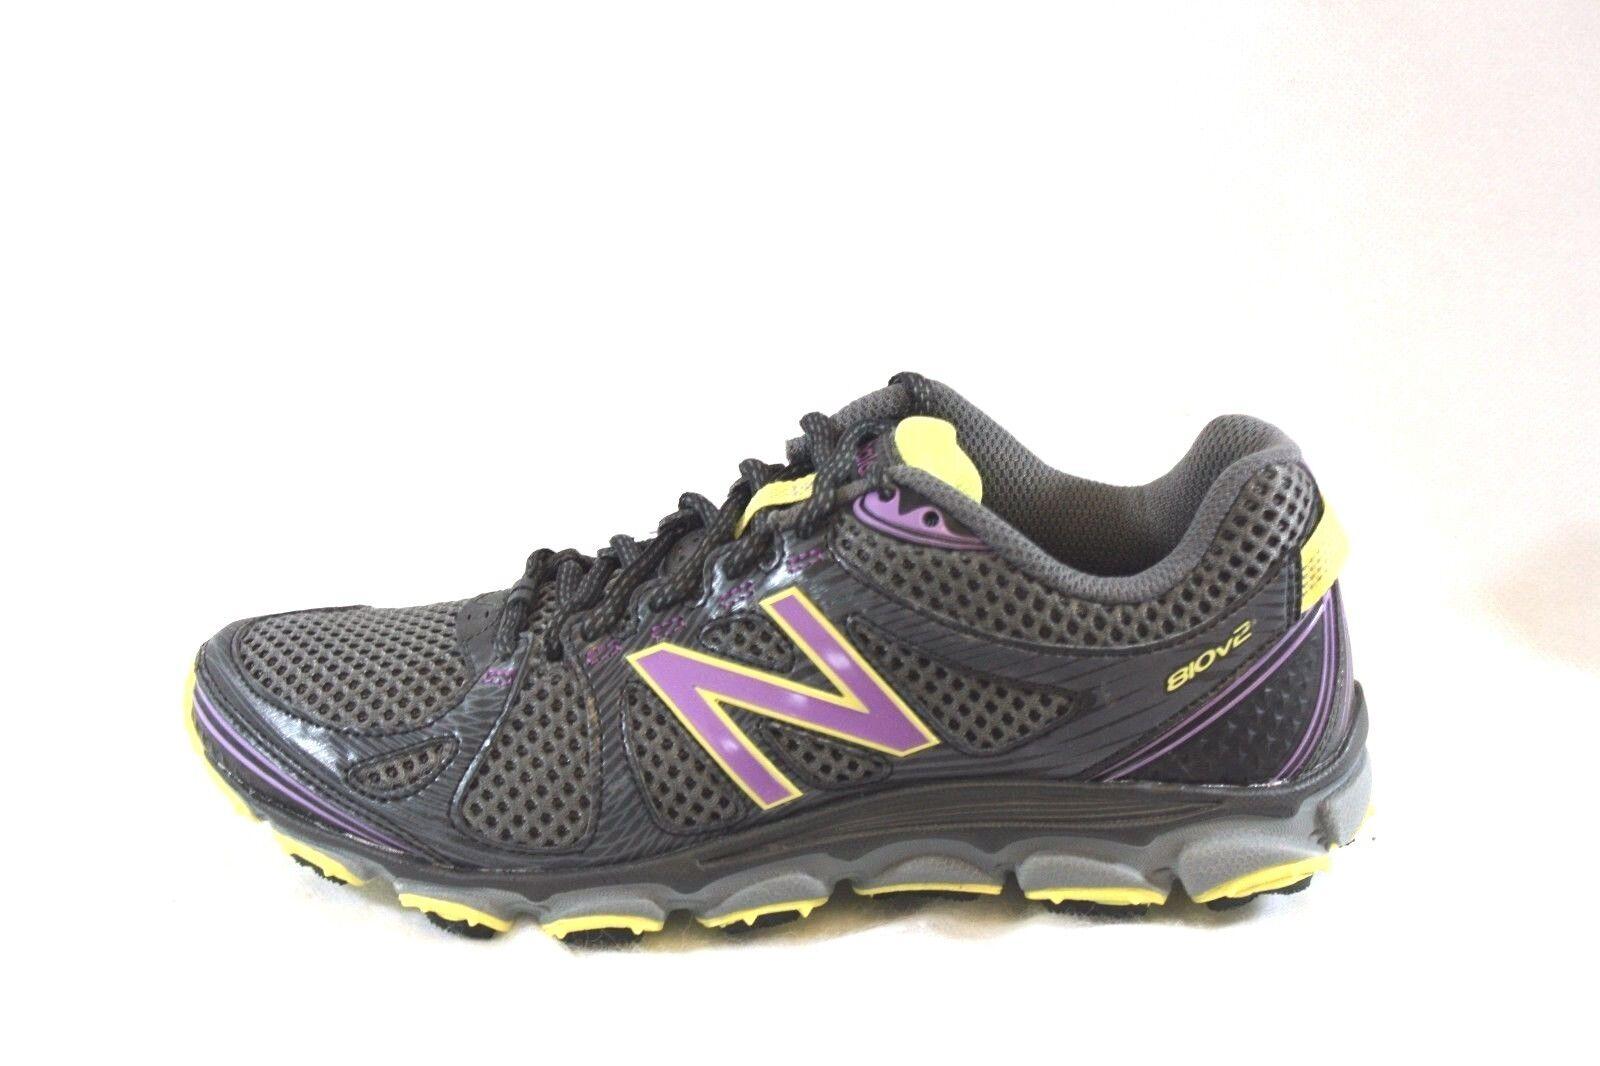 NEU Damenschuhe NEU BALANCE WT 810 PY2 Gray Purple Yellow Running Sneakers Schuhes